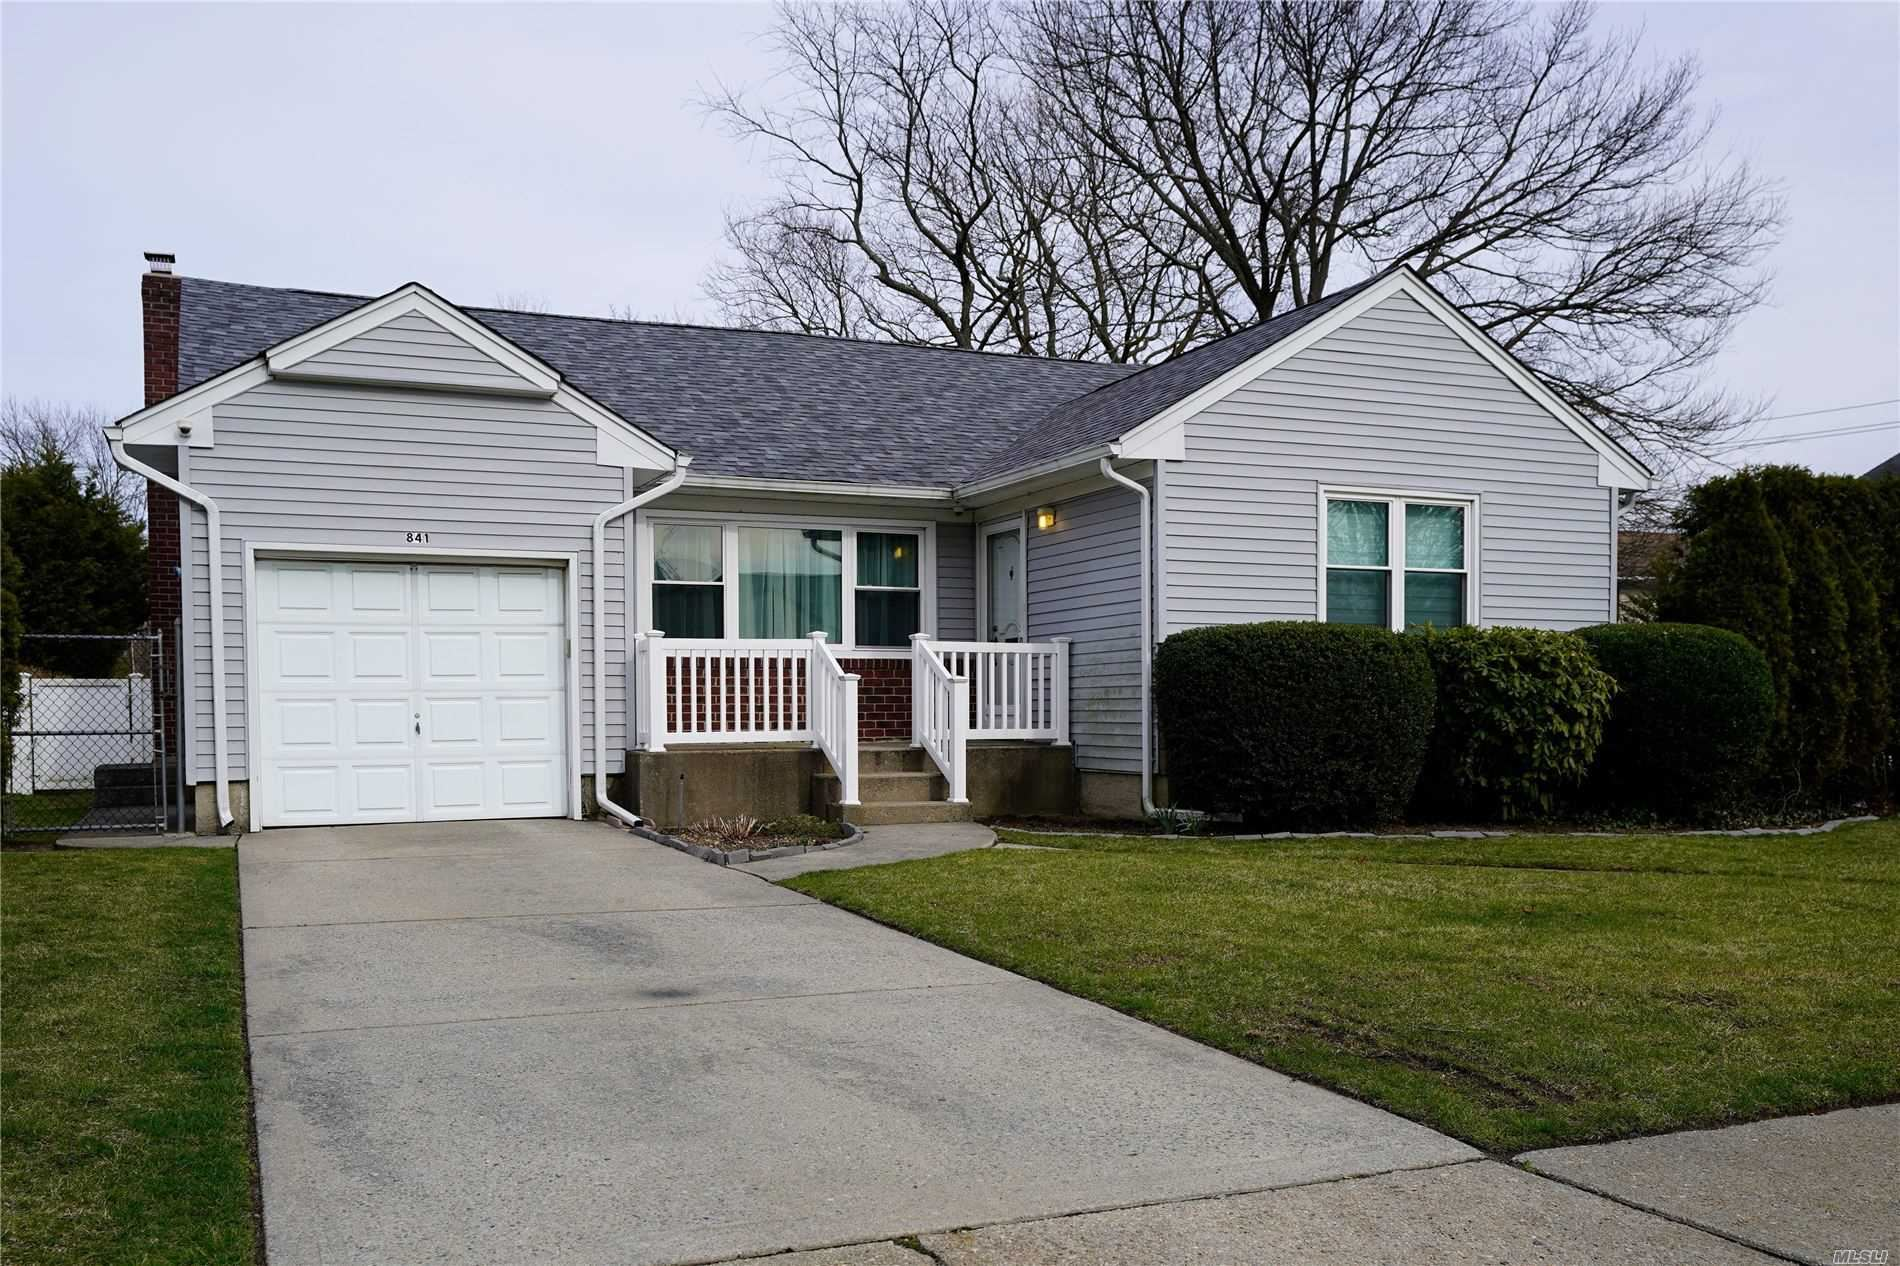 841 Cynthia Drive, East Meadow, NY 11554 - MLS#: 3209258